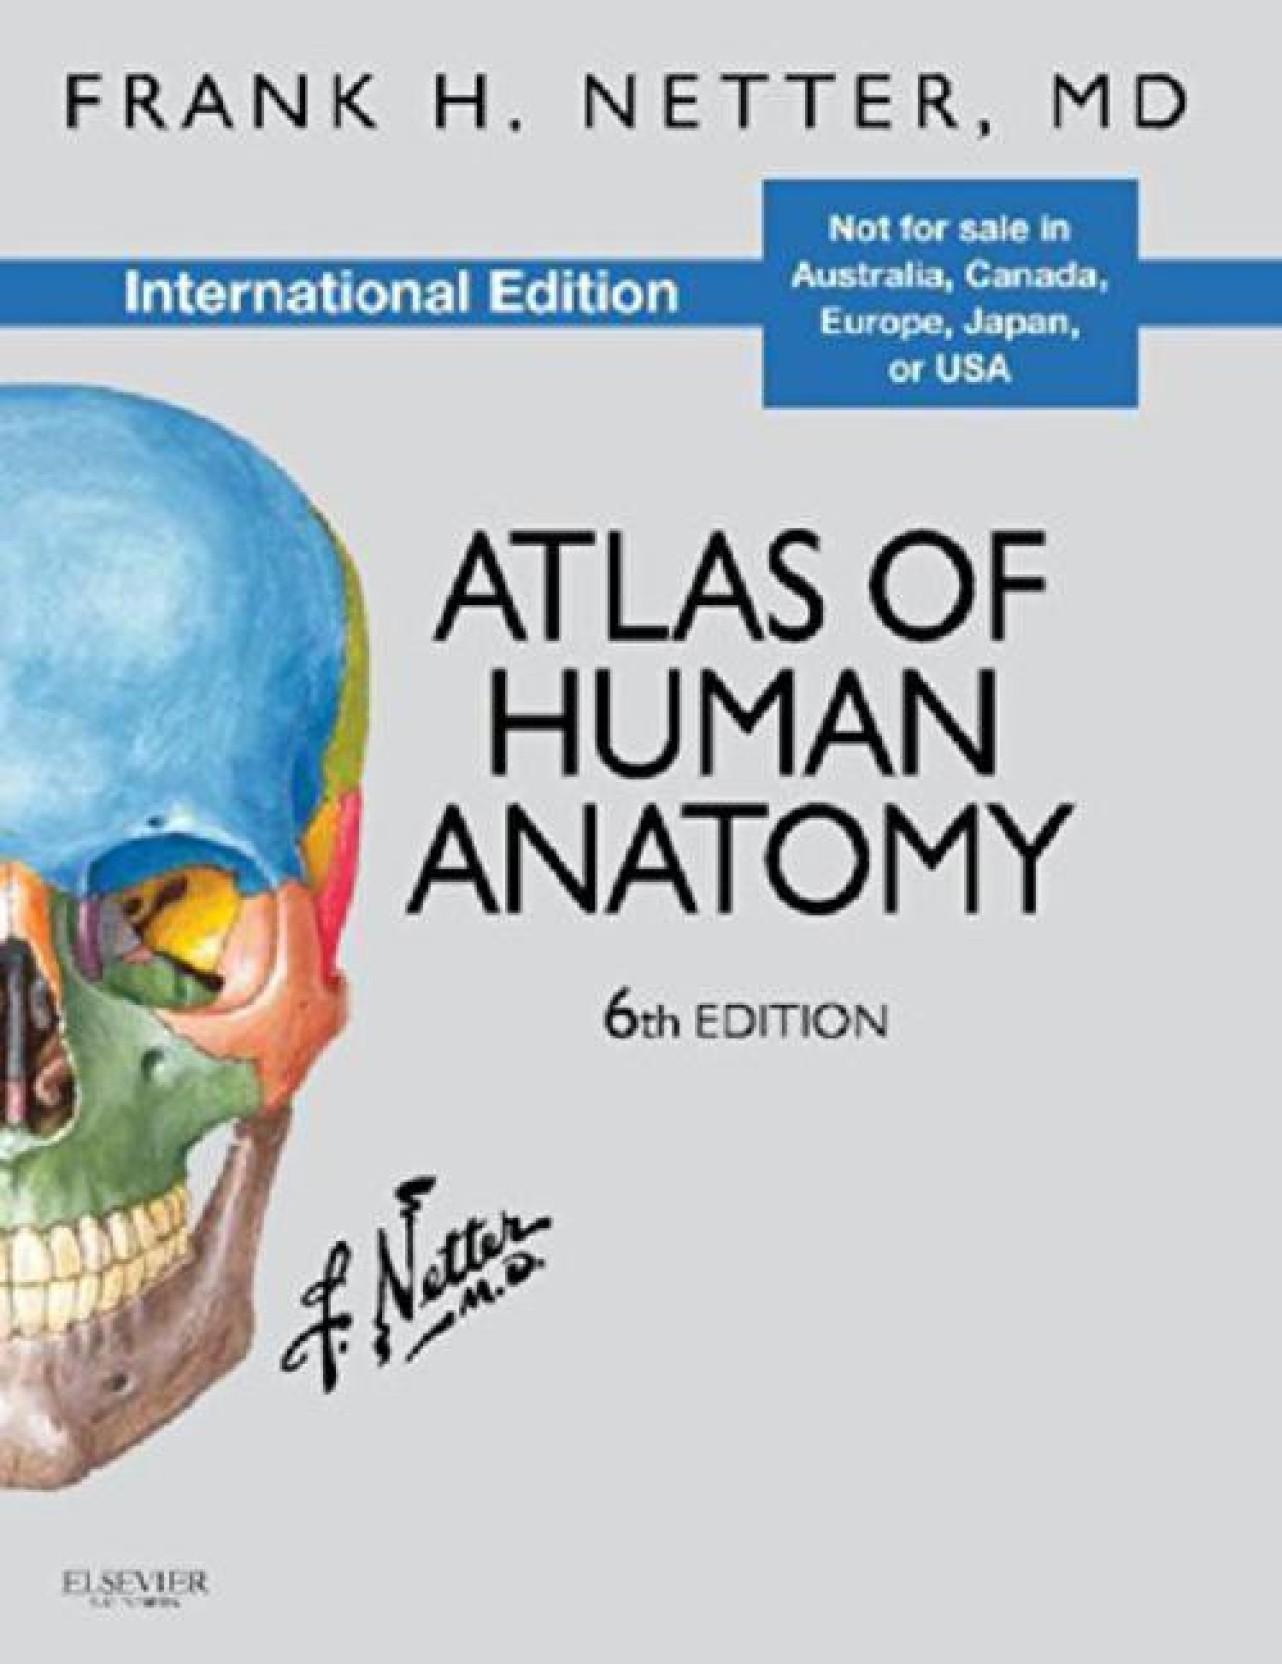 Atlas of Human Anatomy, International Edition 6th Edition: Buy Atlas ...